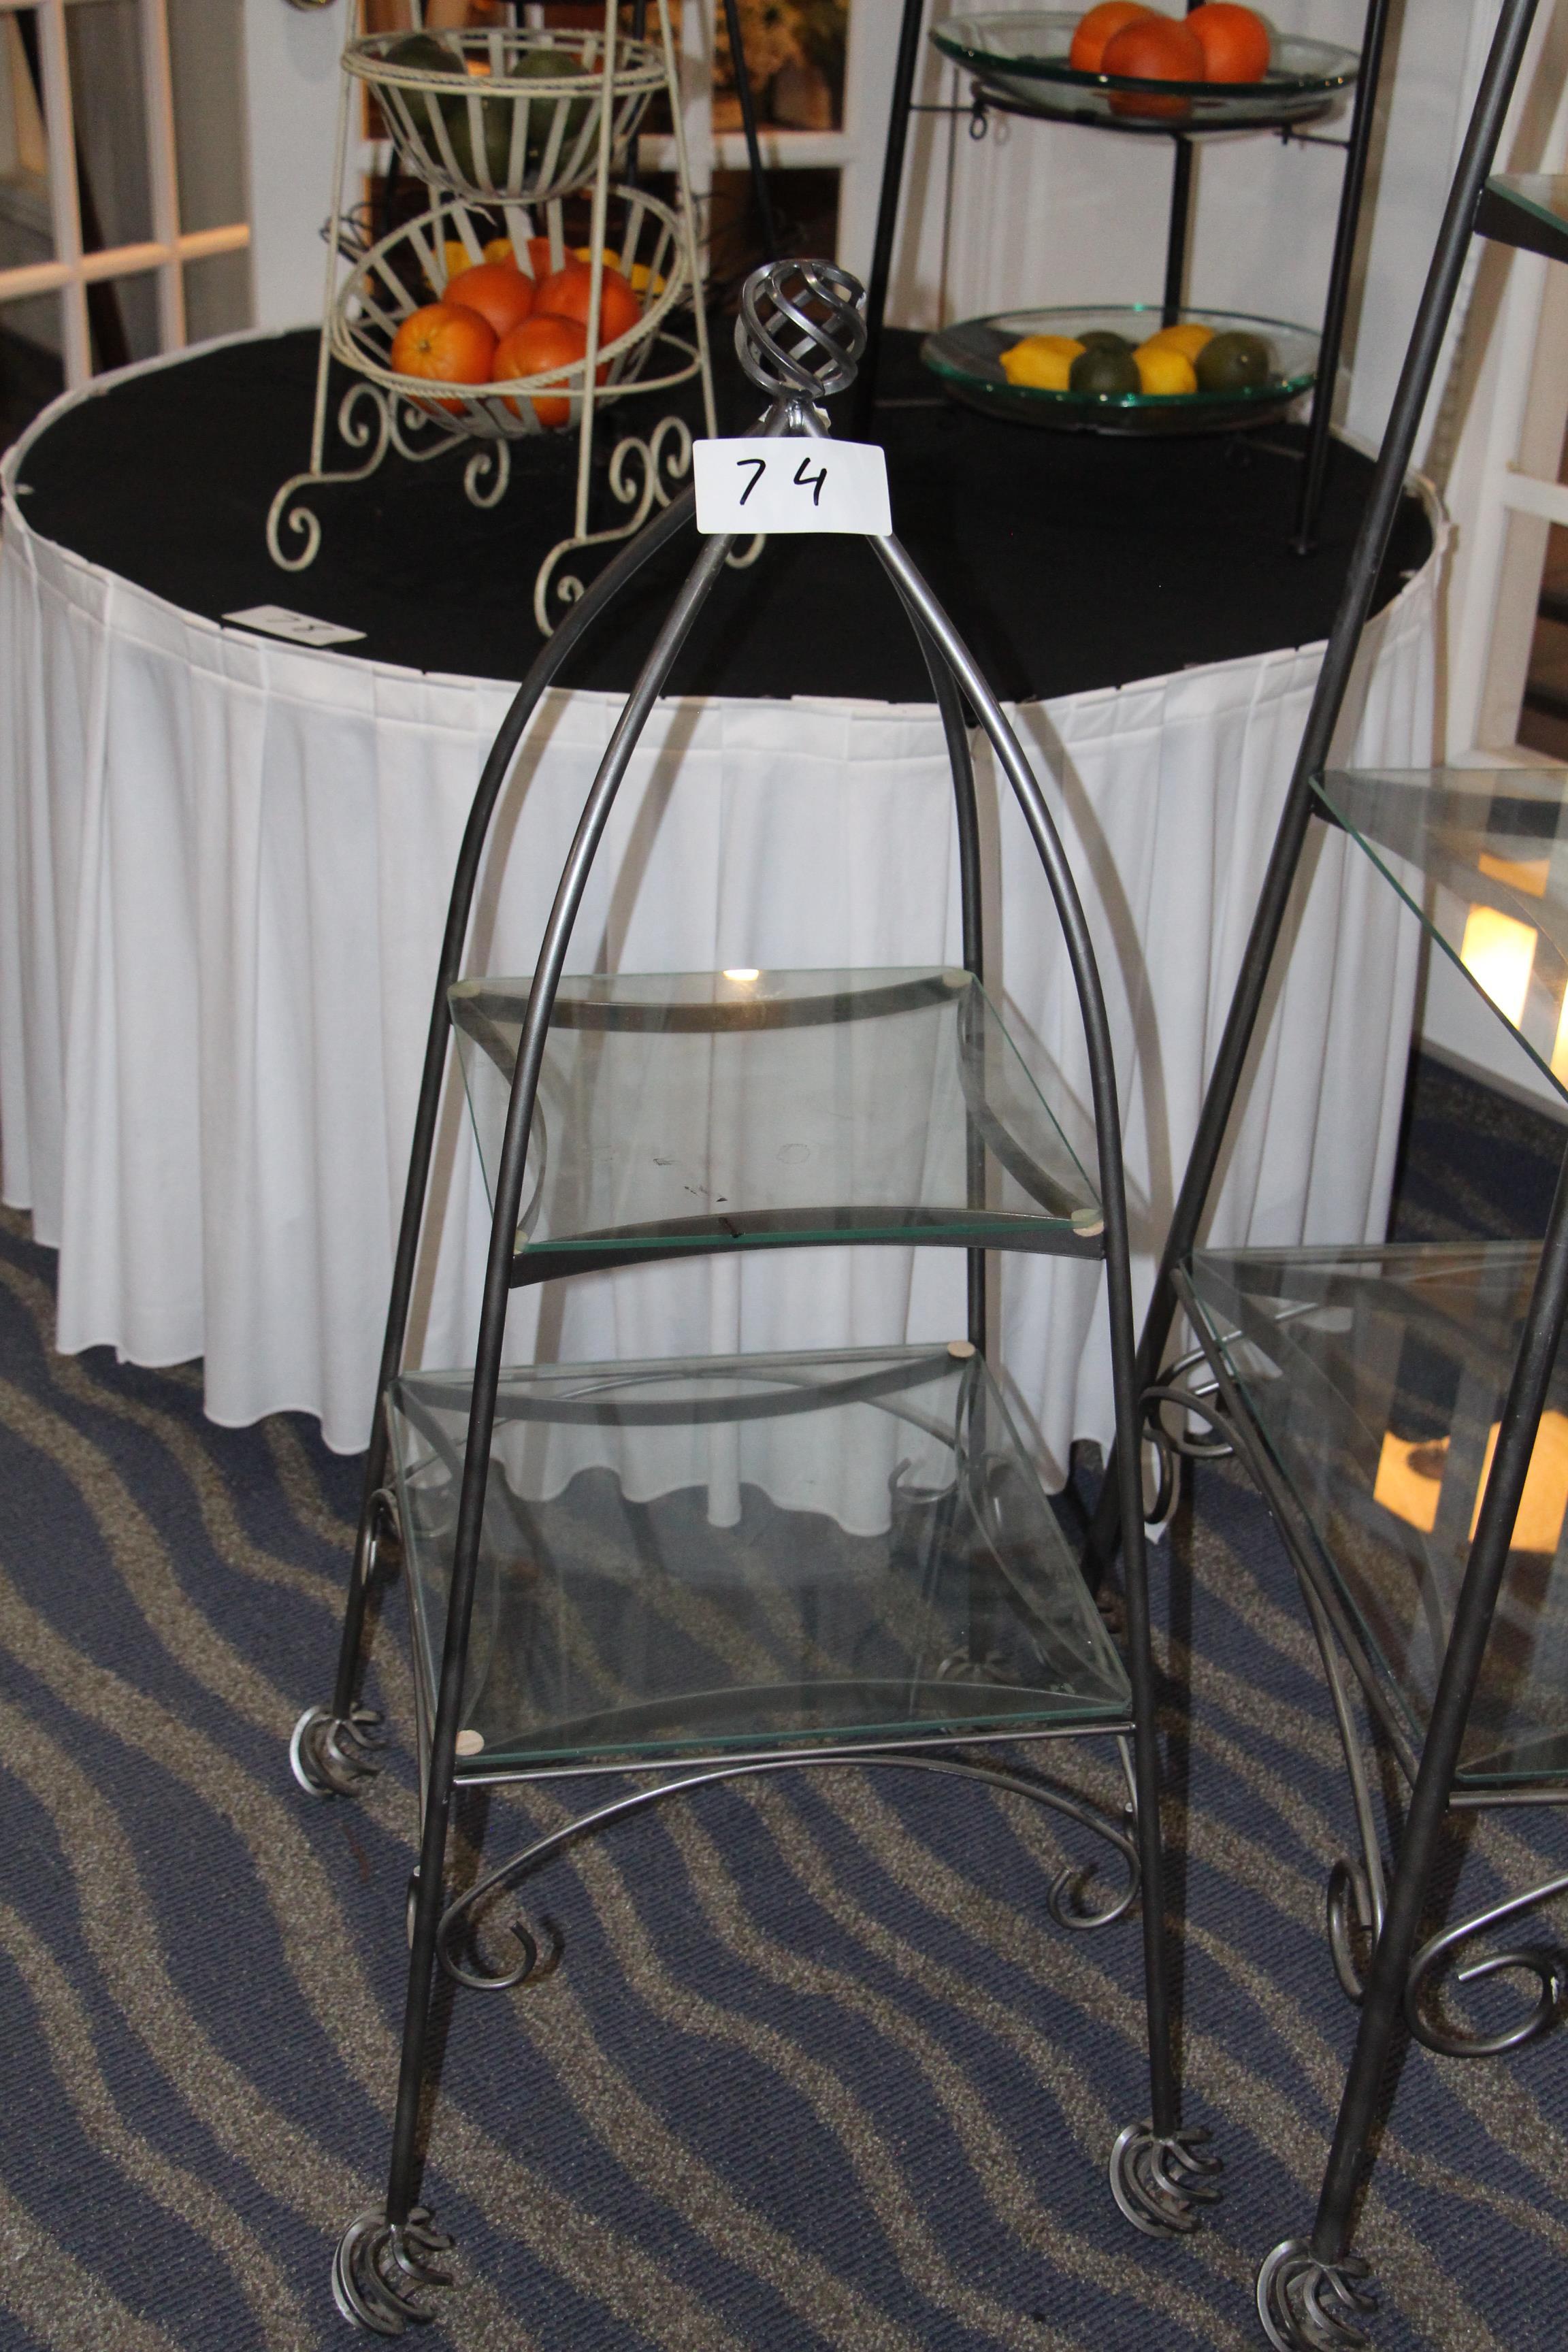 Lot 74 - Wrought iron rectangular 2 tier stand w/ glass shelves